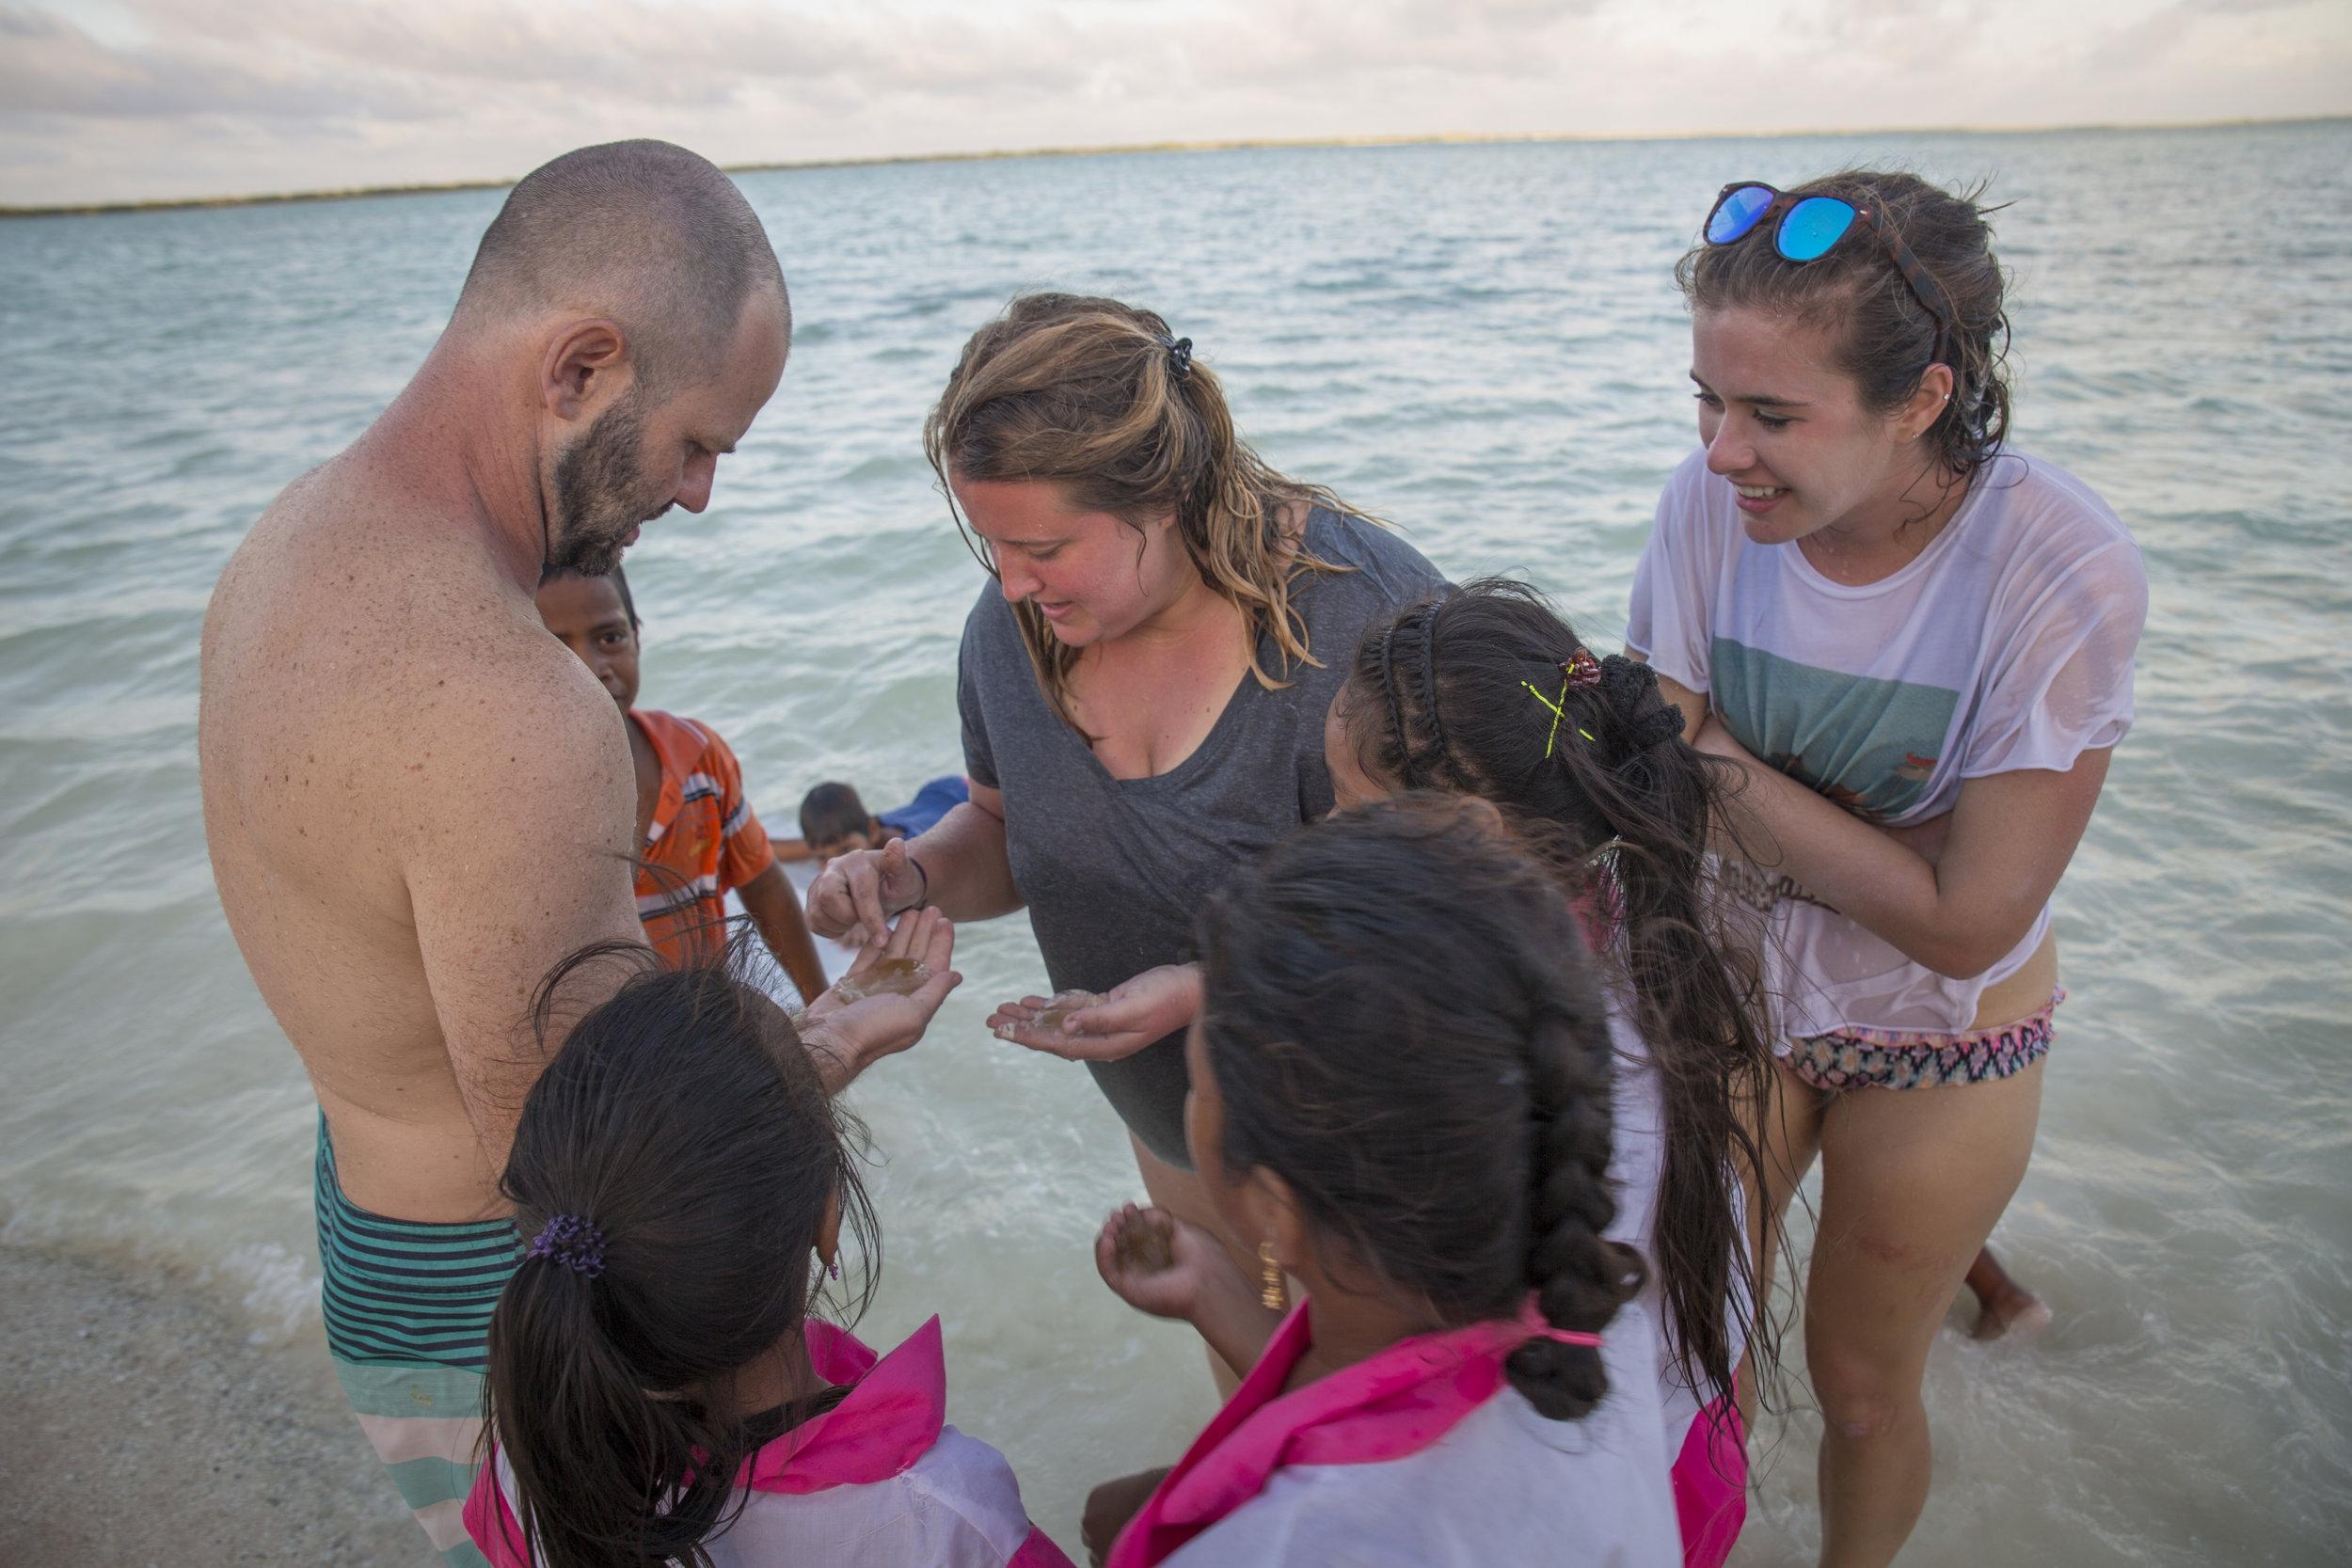 Identifying intertidal creatures in Kanton, Kirabati